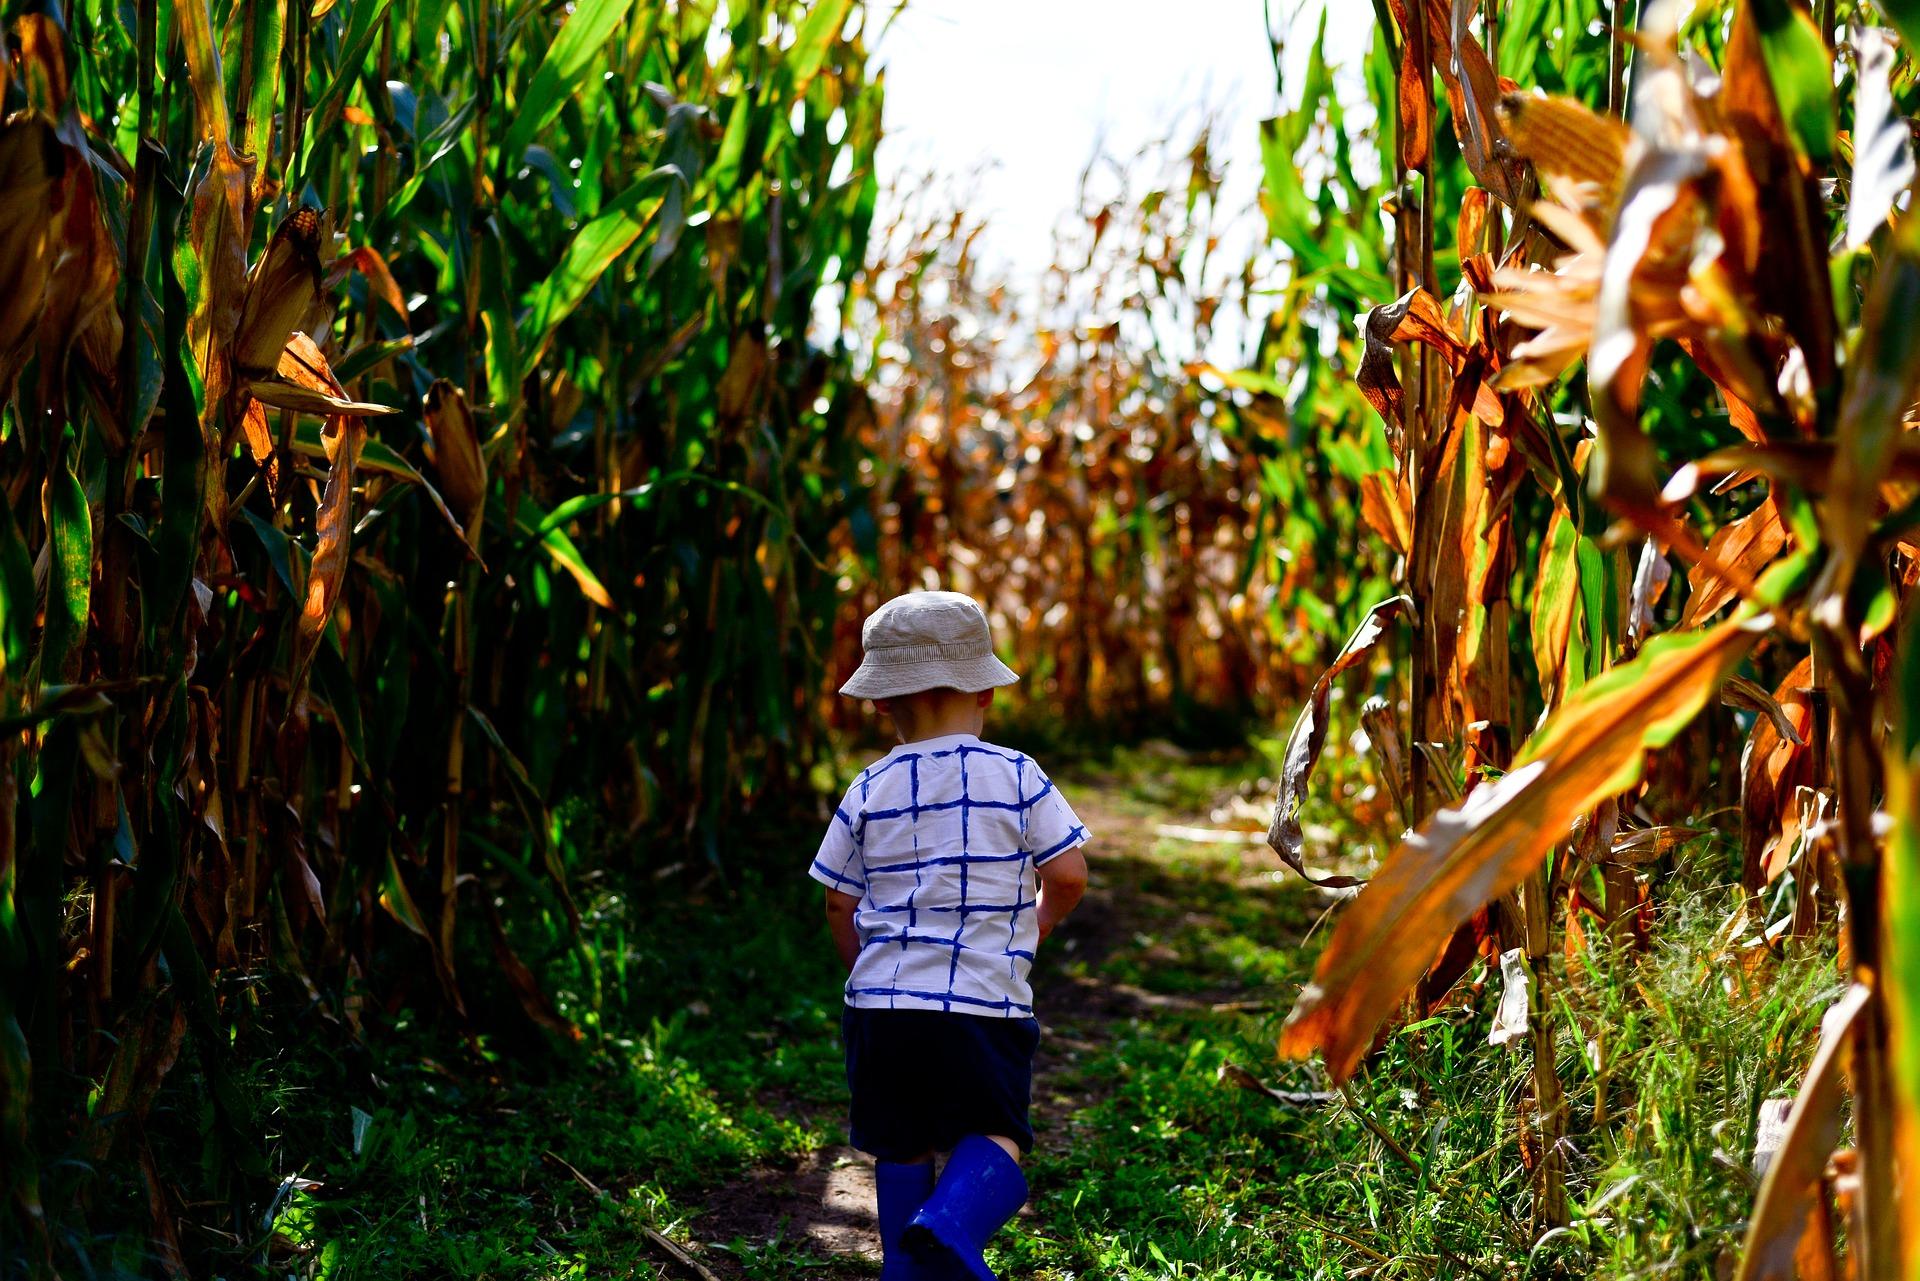 A child walking through a corn maze.